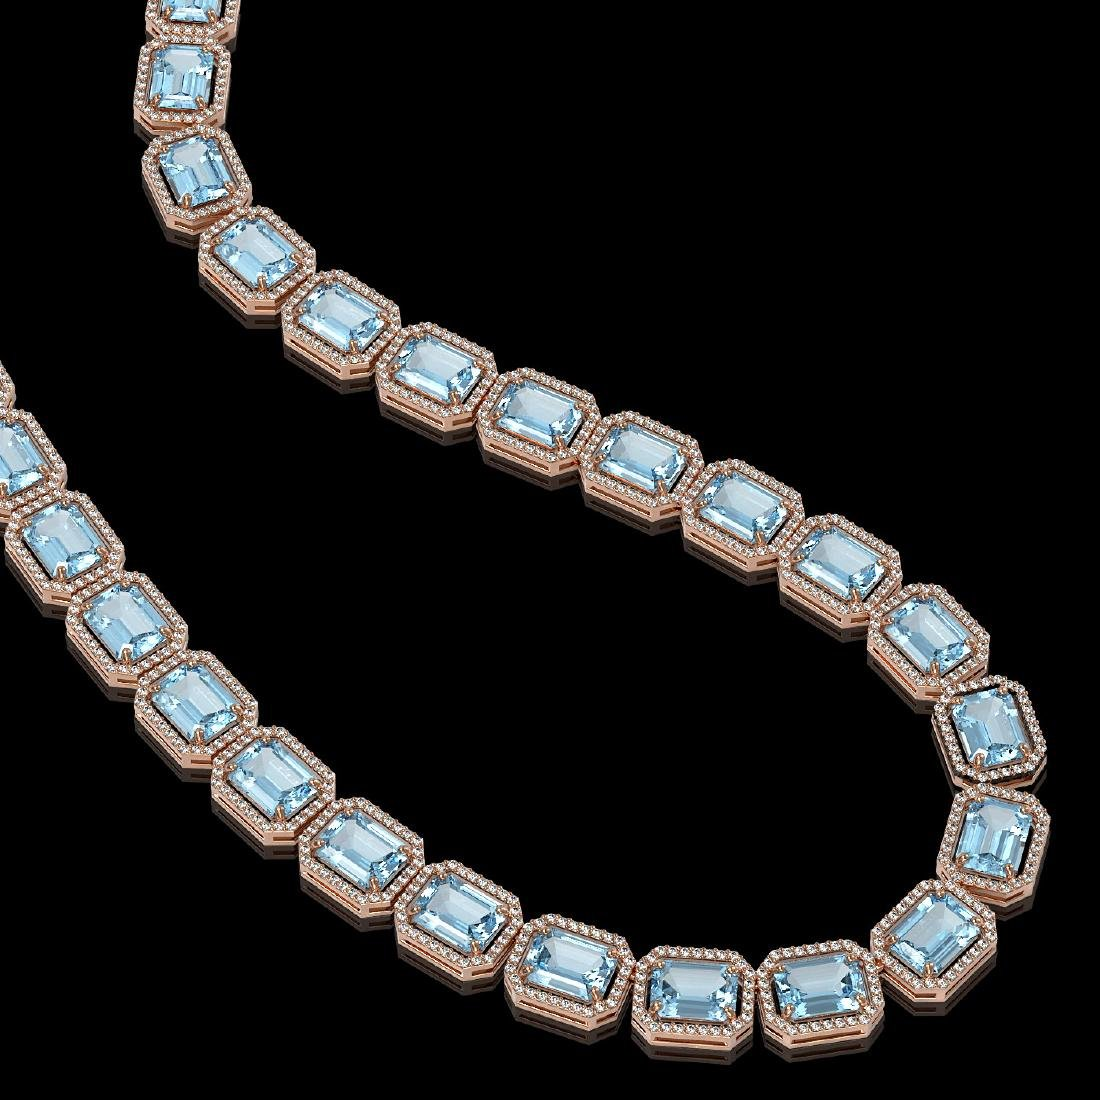 80.98 CTW Aquamarine & Diamond Halo Necklace 10K Rose - 2